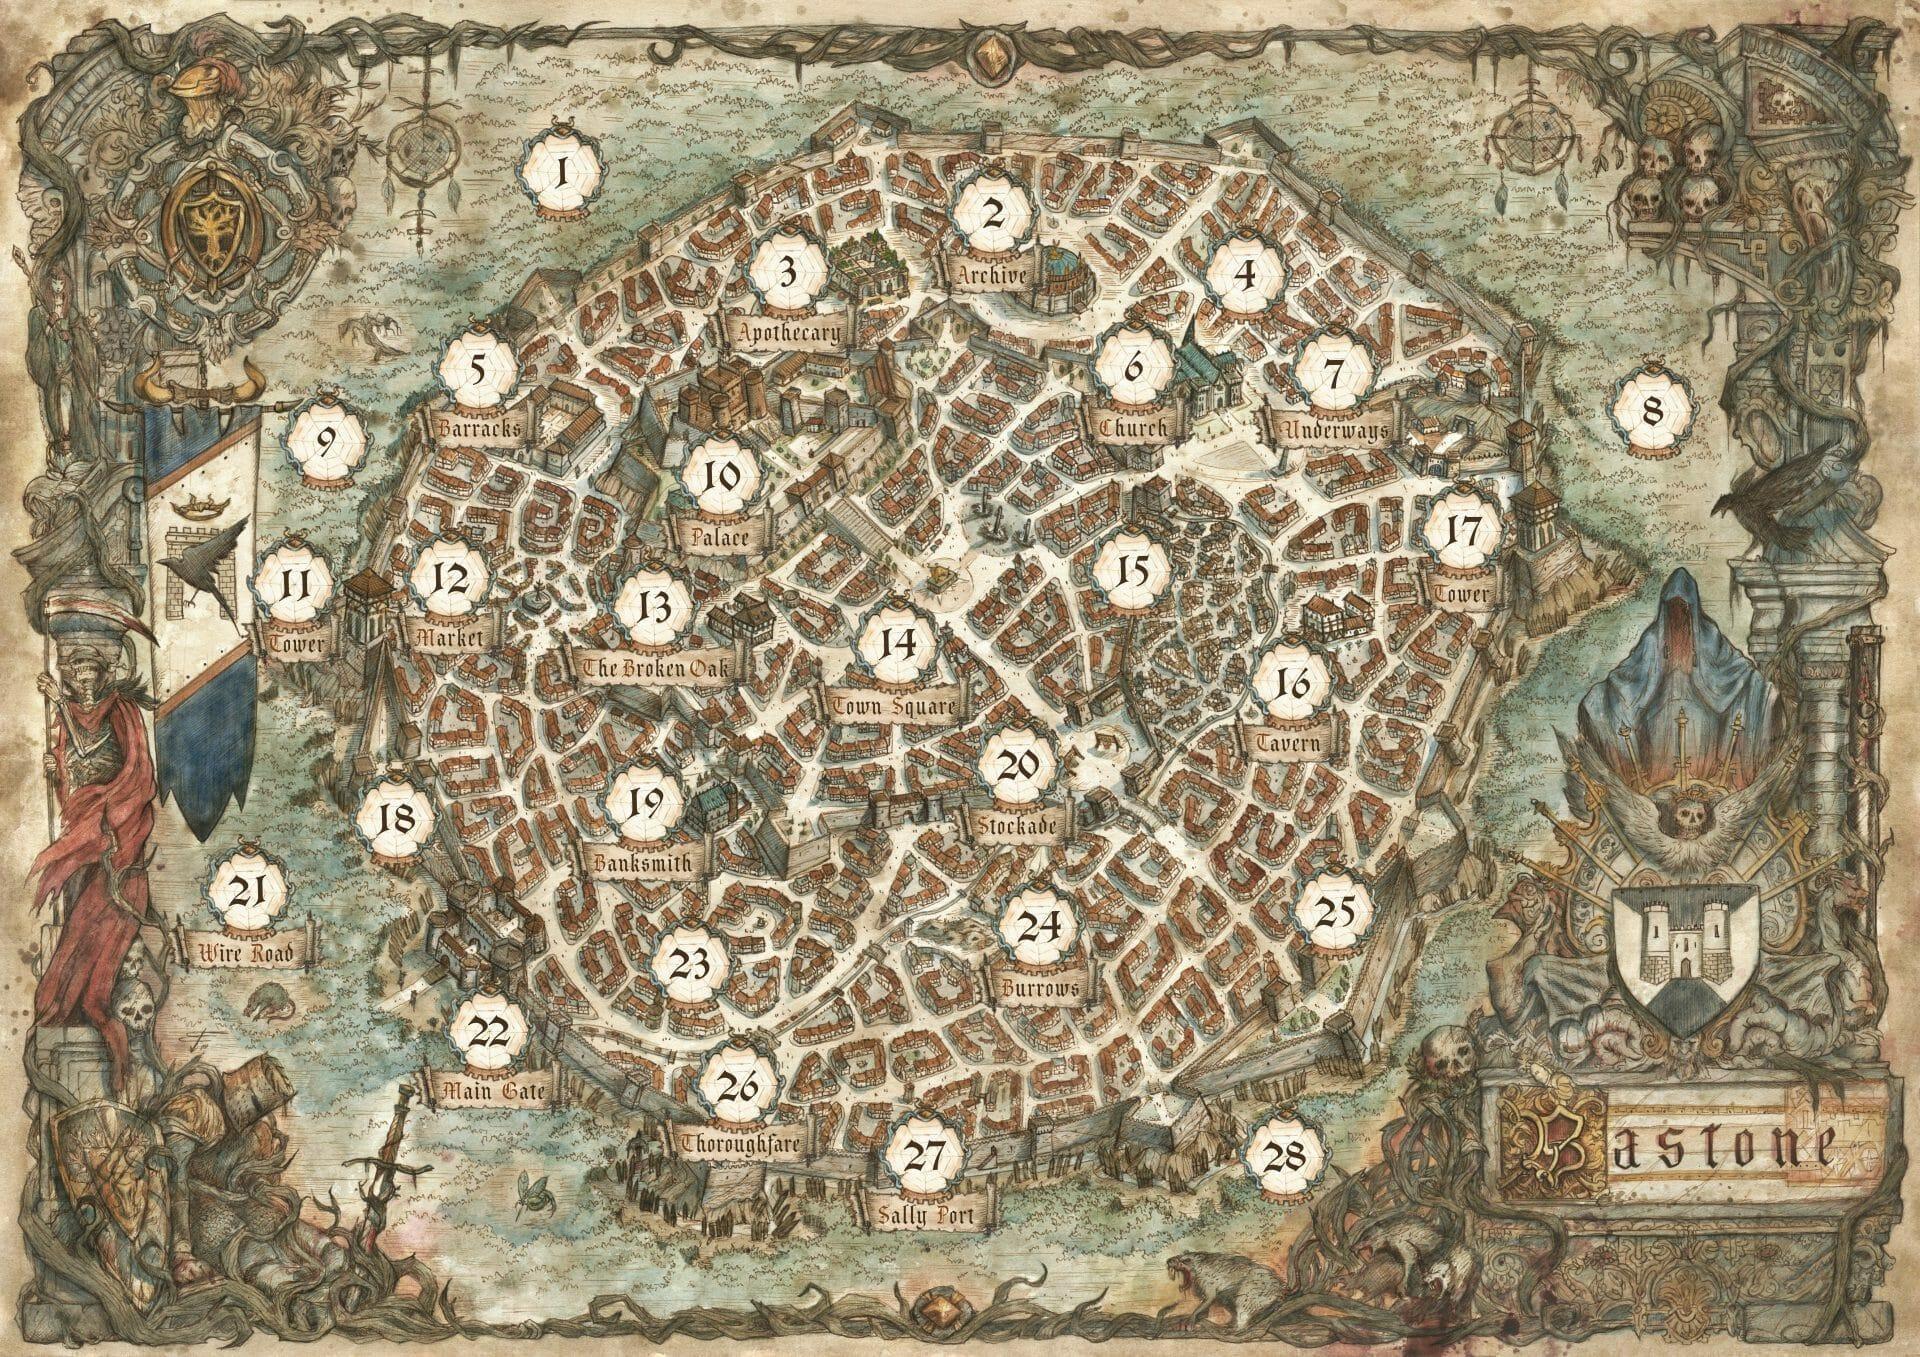 Oathsworn map: Bastone